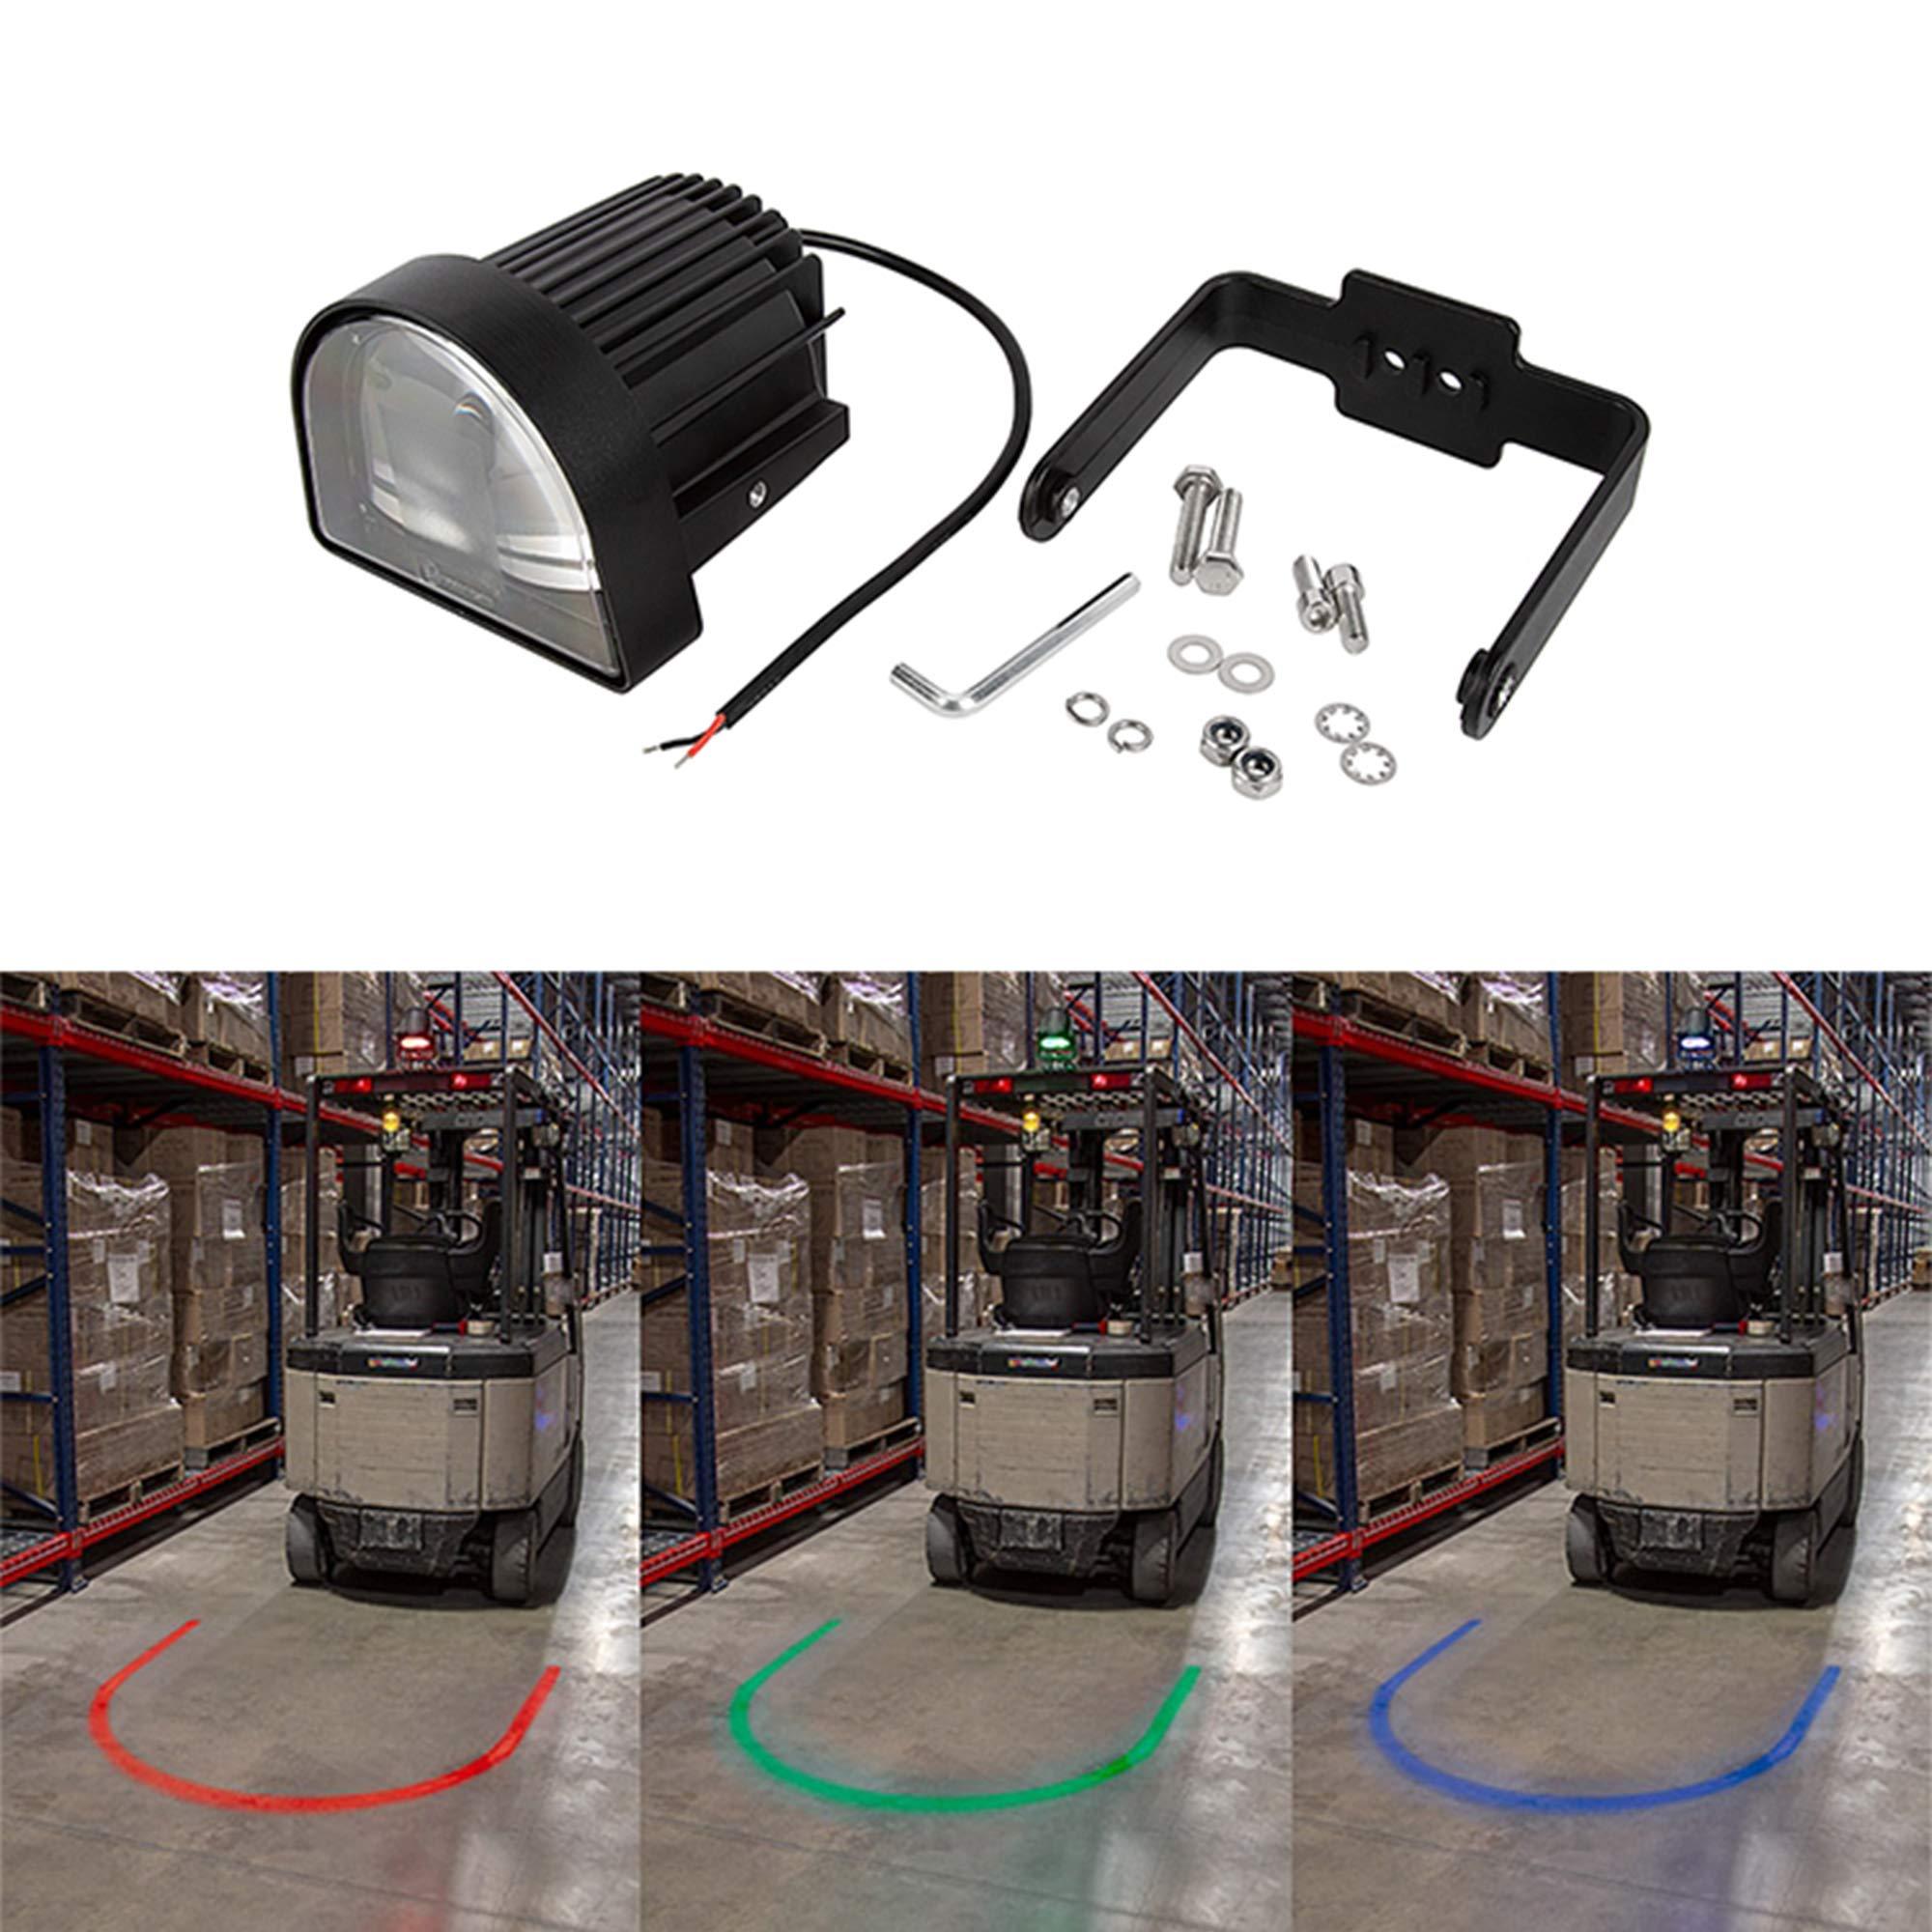 XRLL LED Forklift Safety Warning Light Arc Beam Pattern,Warehouse Reversing Blue Spot Warning Light,U Beam Forklift Red Zone Danger Area Lights 10-80V (Red)